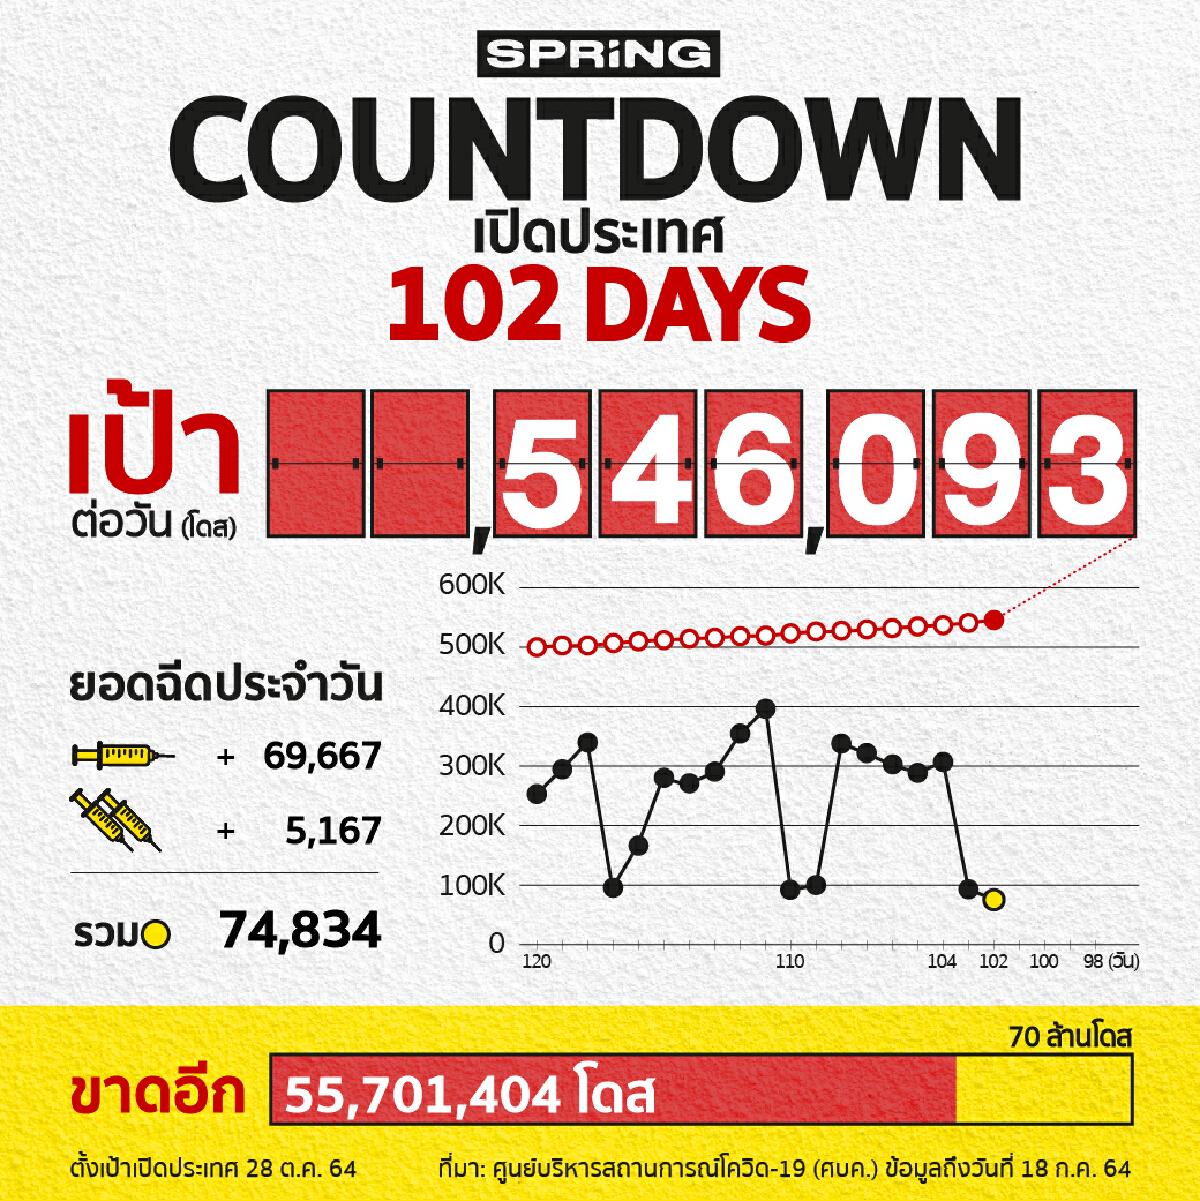 COUNTDOWN! เปิดประเทศใน 102 วัน ฉีดวัคซีนโควิดได้ 74,834 โดส